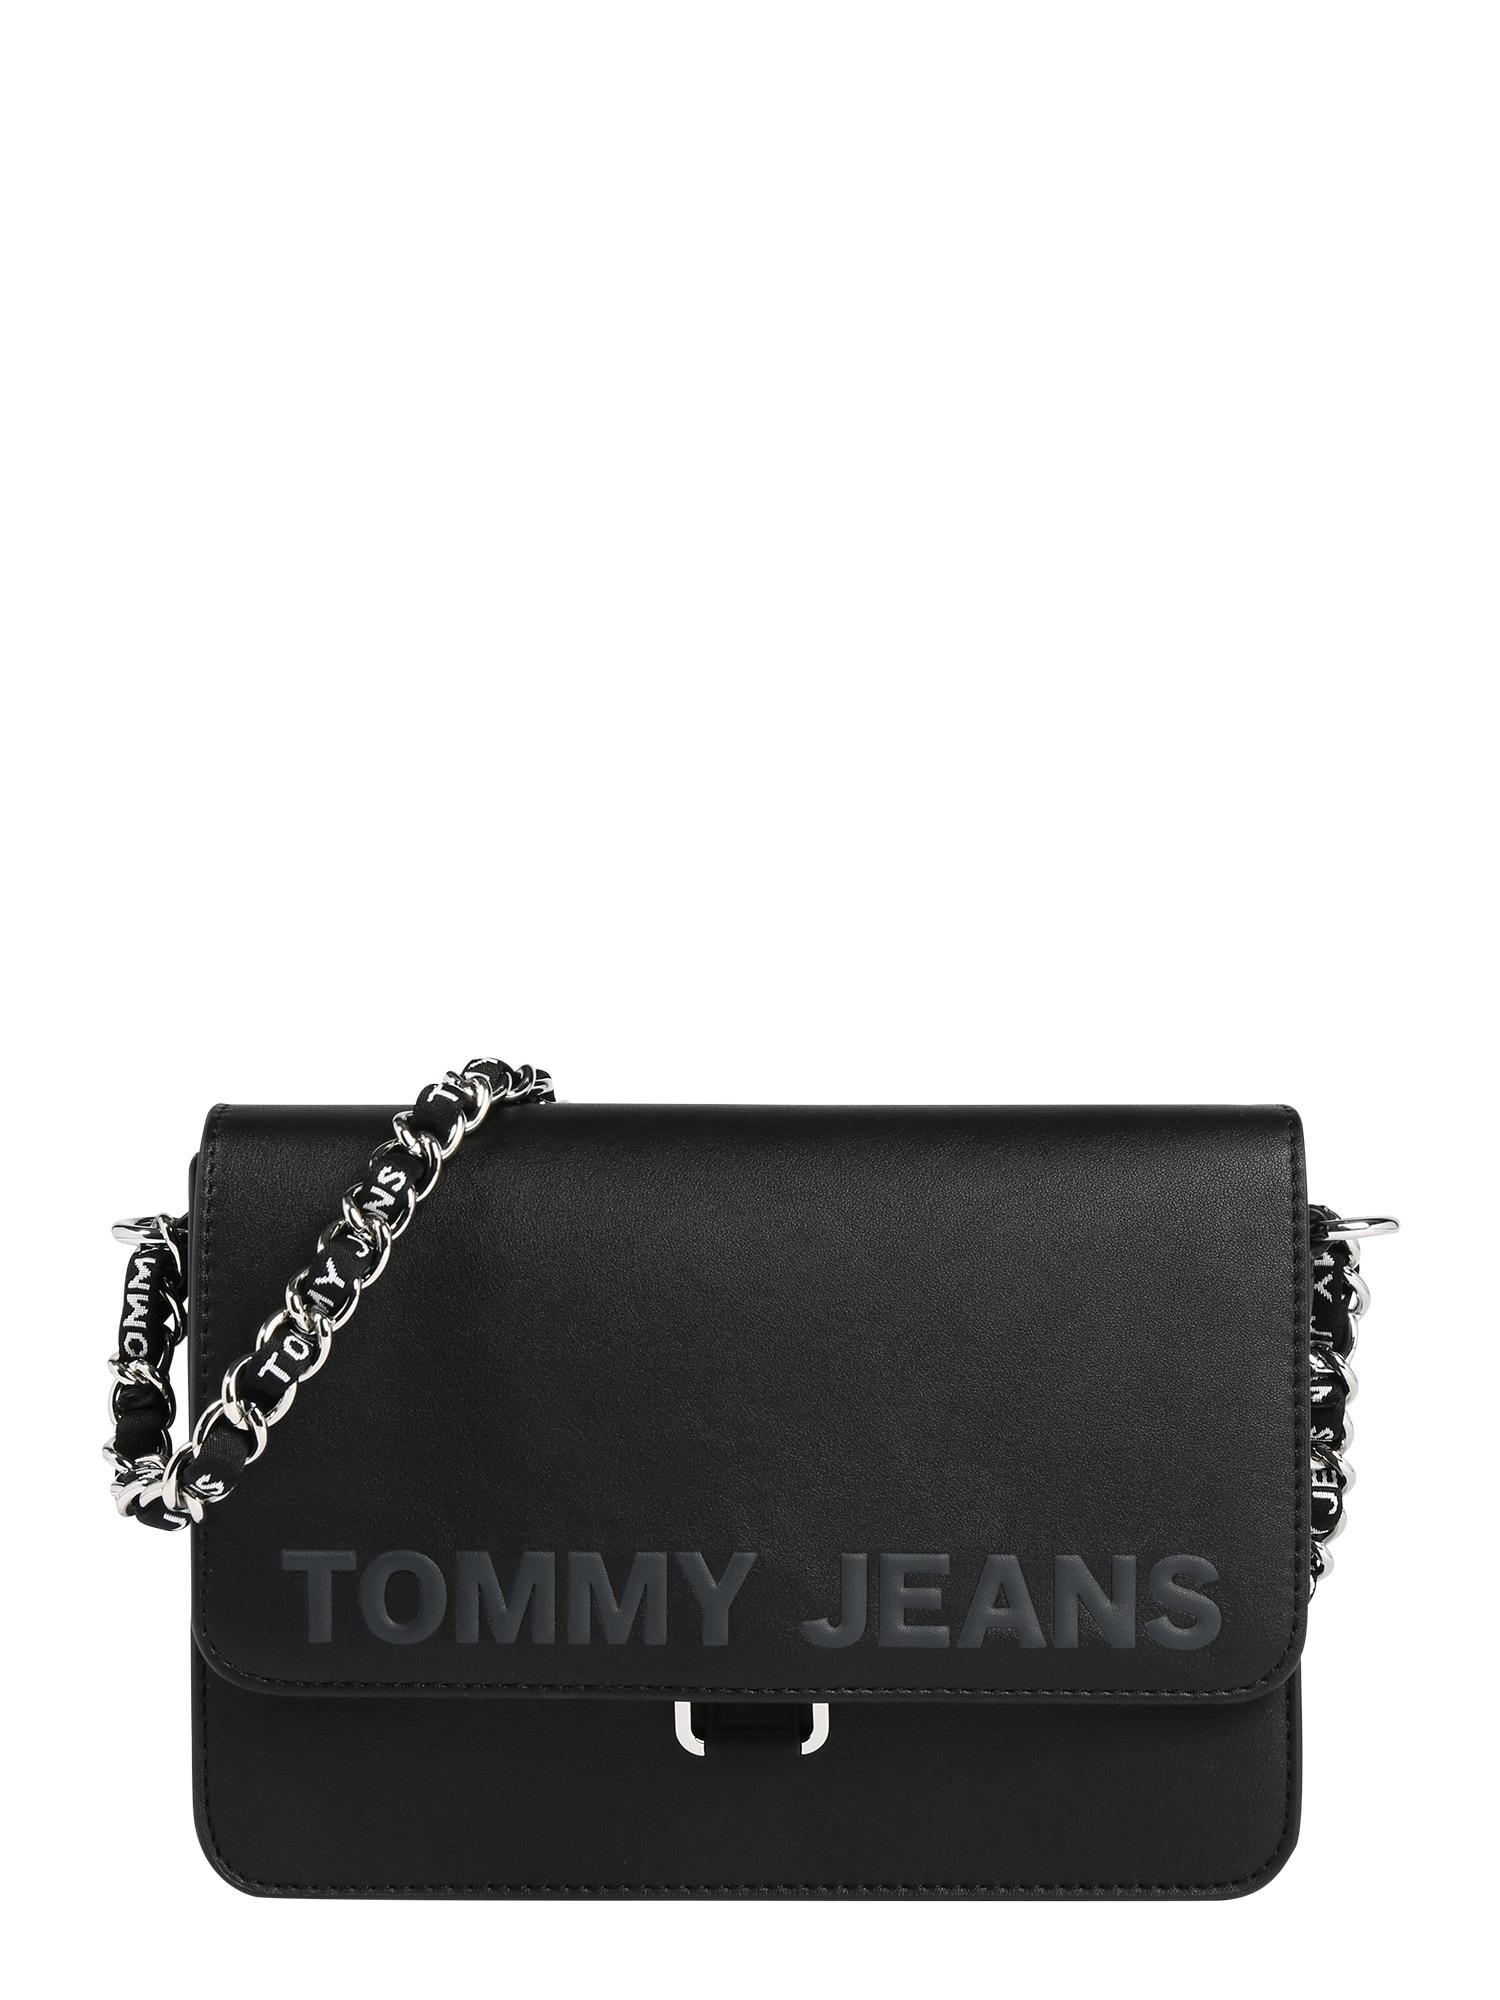 Tommy Jeans Taška cez rameno 'TJW ITEM FLAP CROSSOVER'  čierna